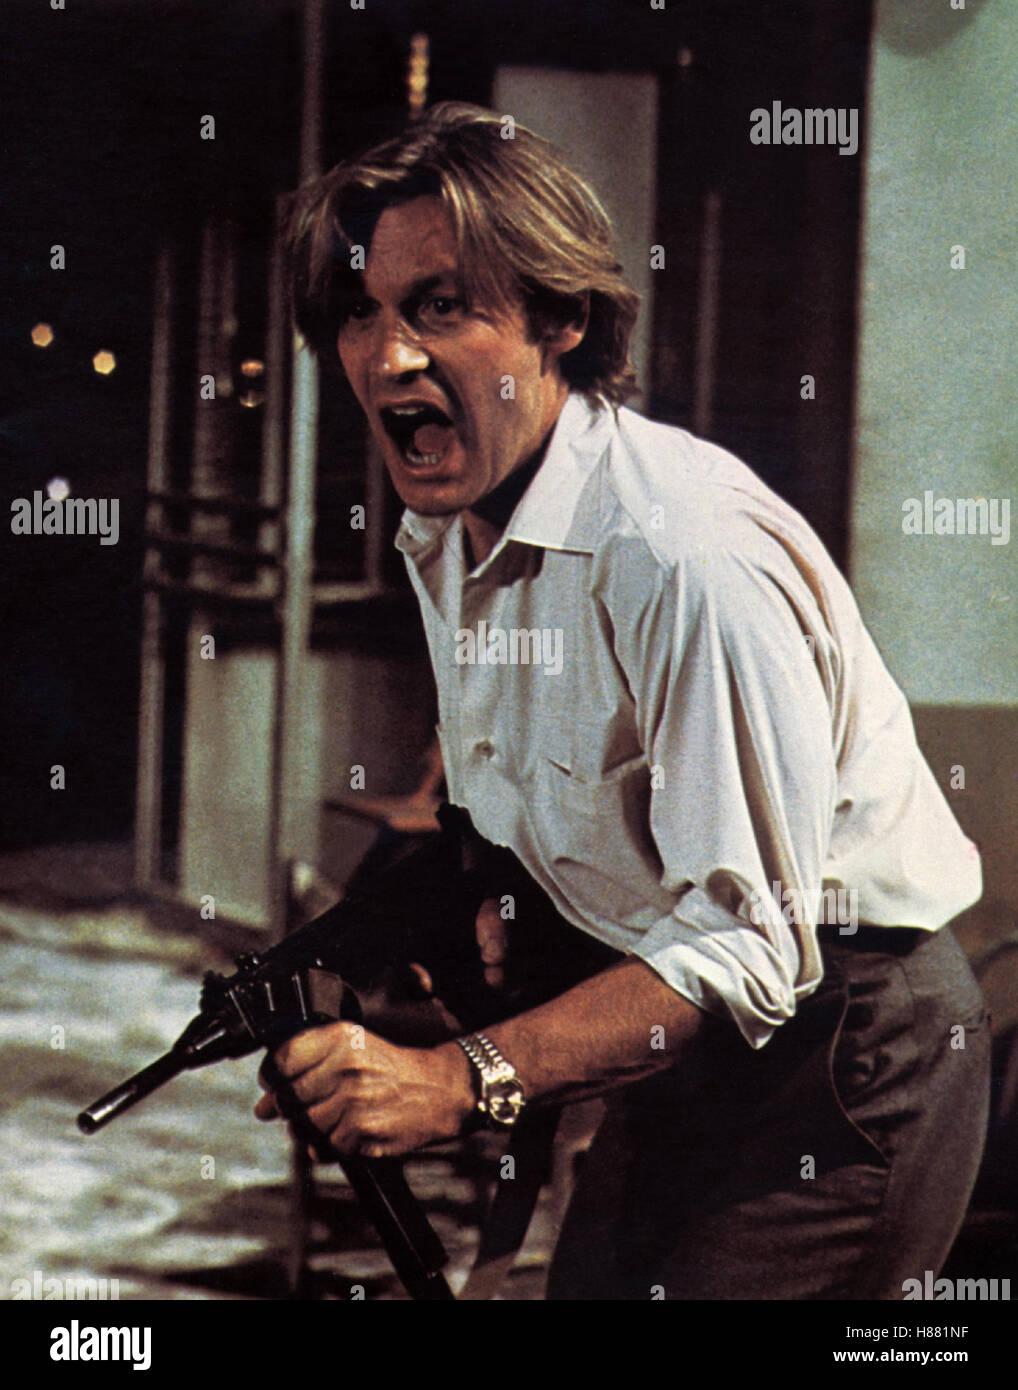 Unternehmen Entebbe, (VICTORY AT ENTEBBE) USA 1976, Regie: Marvin Chomsky, HELMUT BERGER, Stichwort: Maschinengewehr, - Stock Image